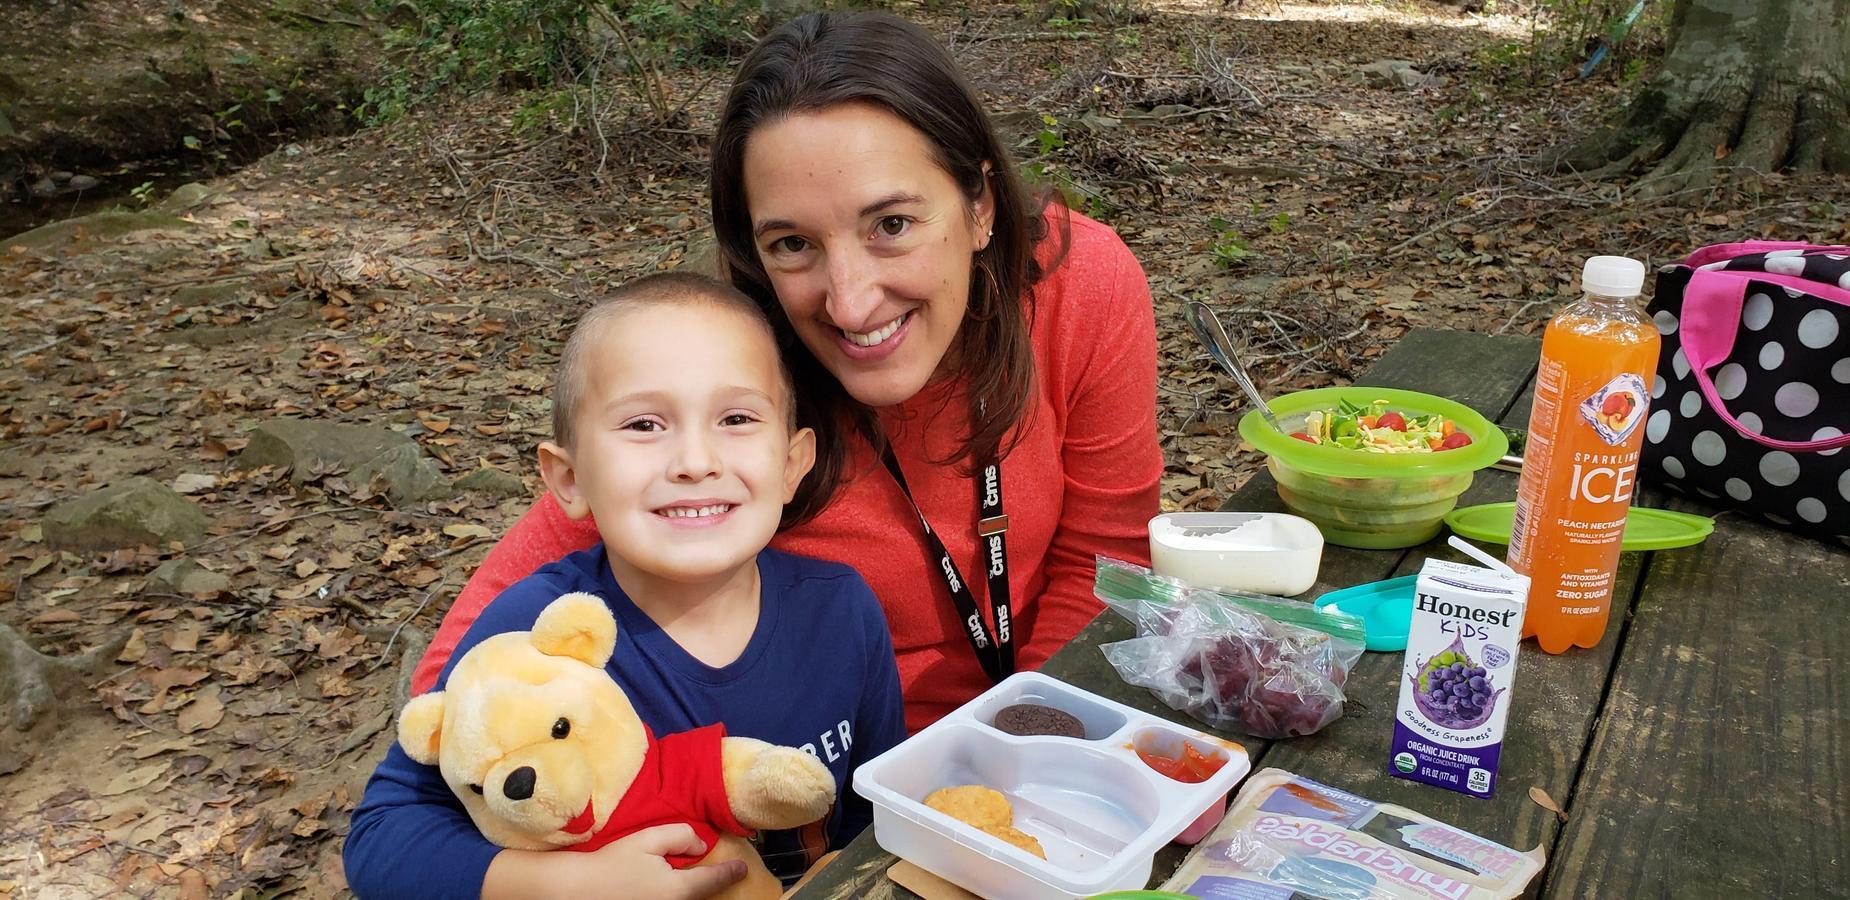 Mom & child at kindergarten picnic